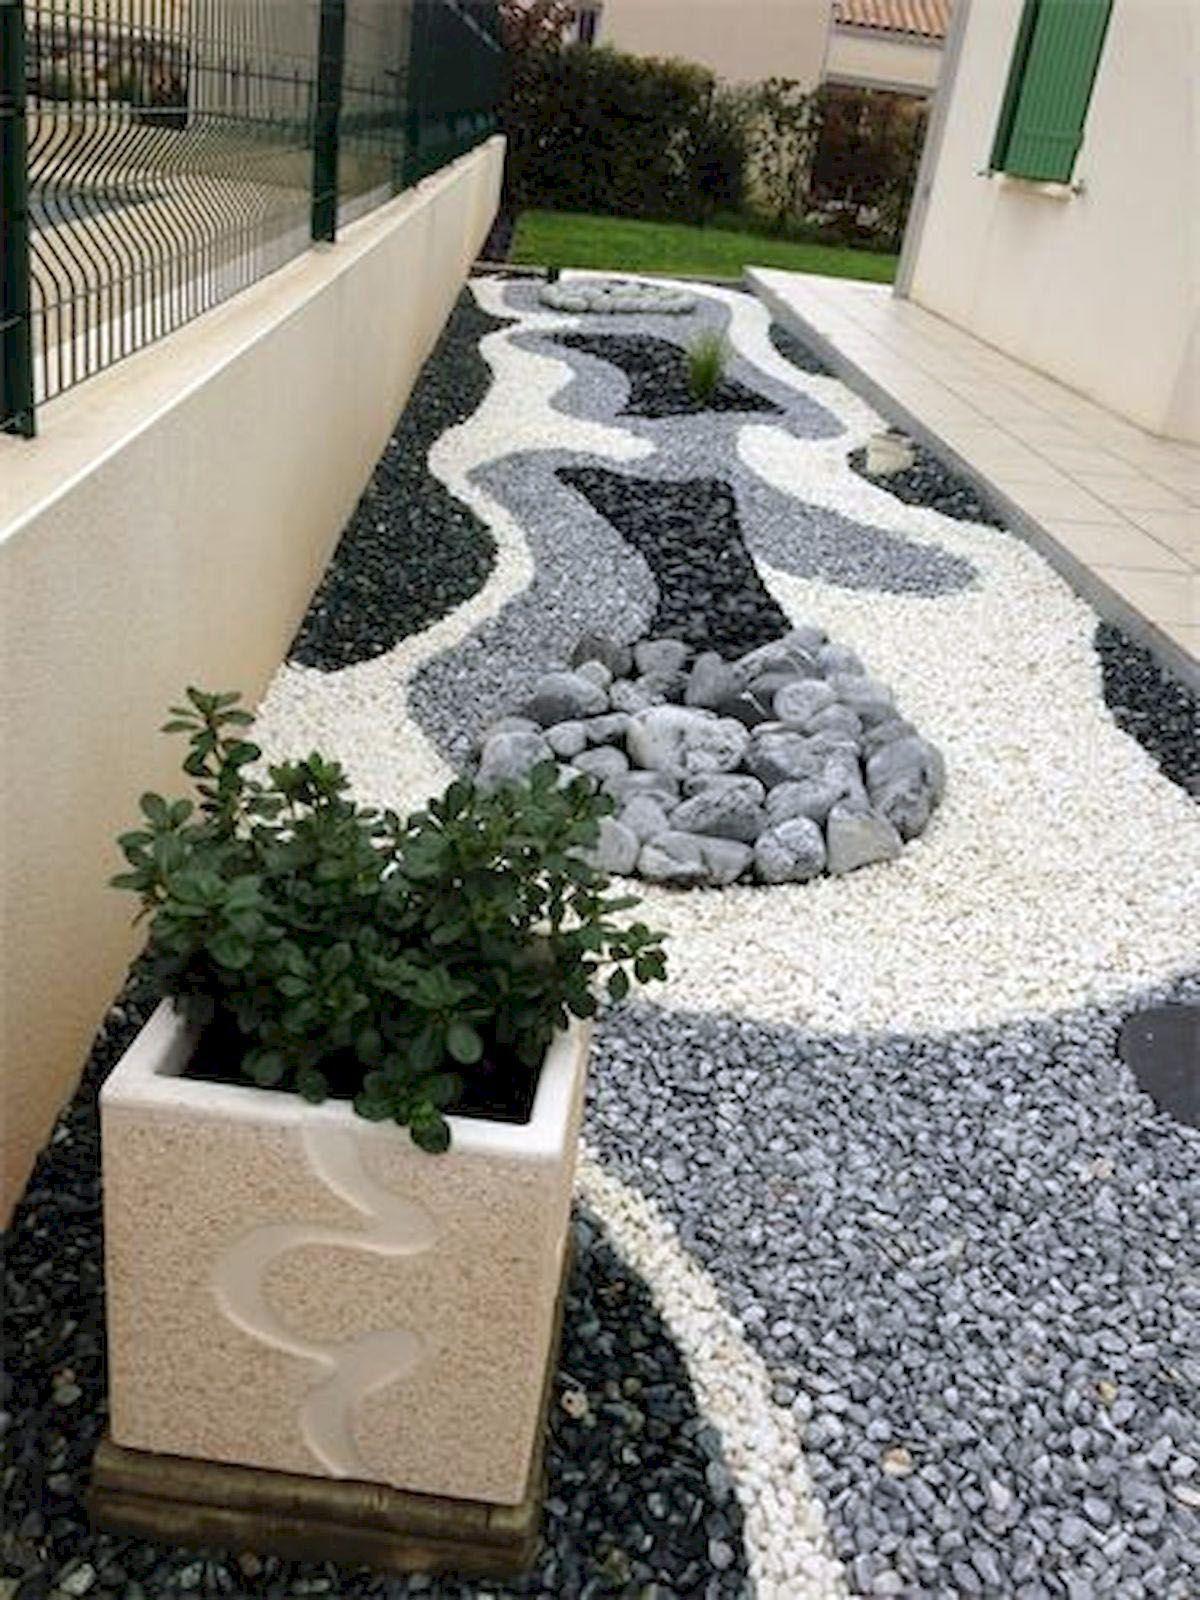 10 Diy Small Backyard Ideas That Make A Big Statement Rock Garden Landscaping Gravel Landscaping Front Yard Landscaping